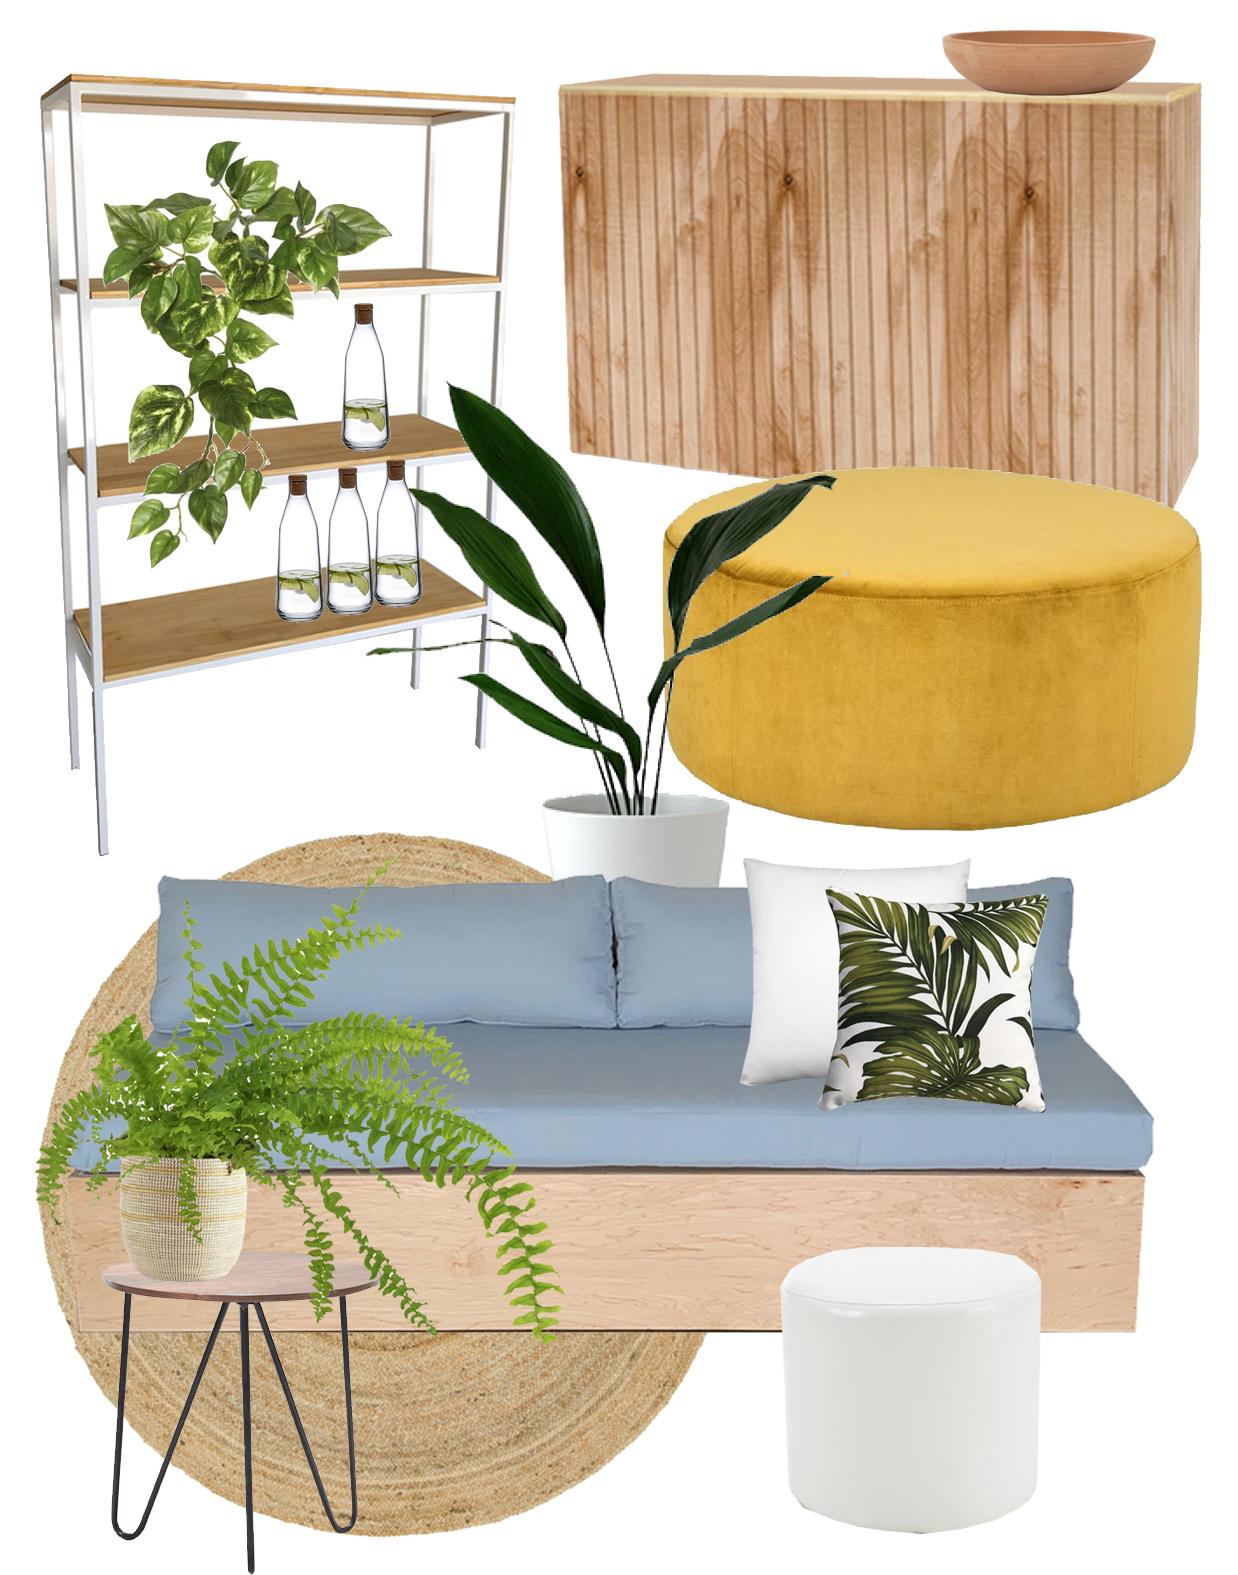 RR-Rentthelook-modernearth-furniture.jpg